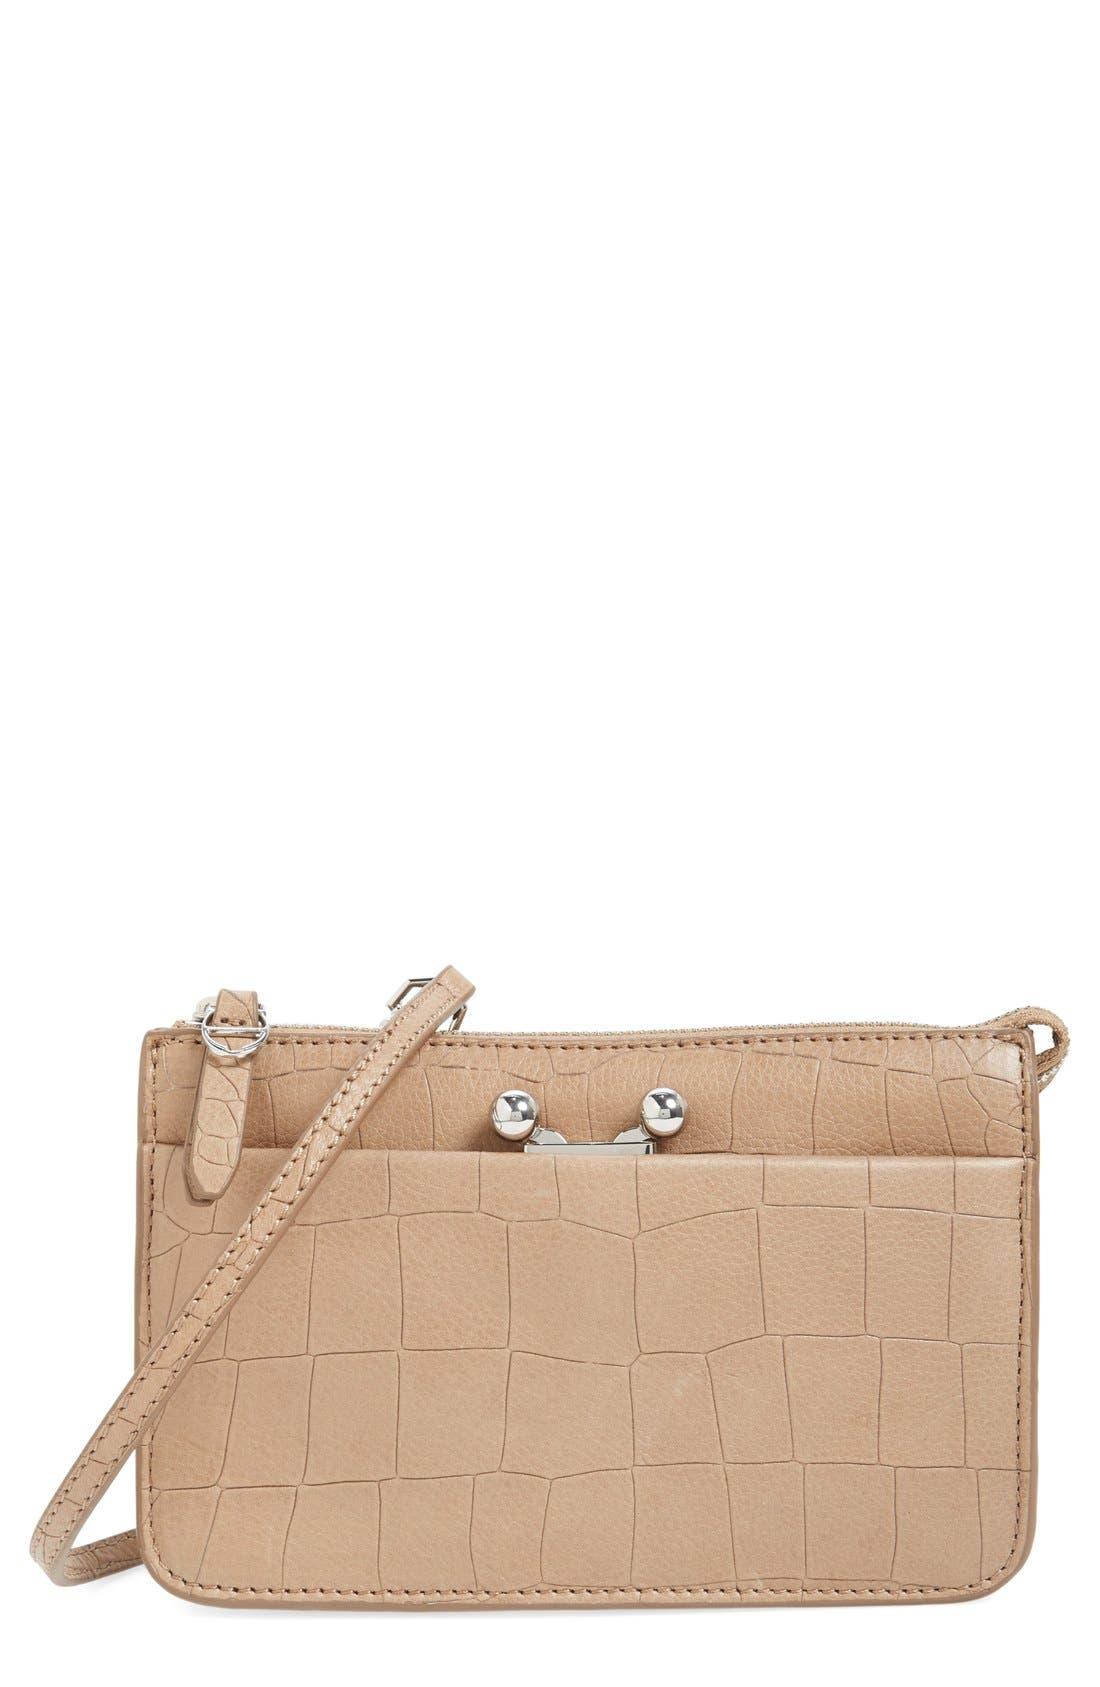 Alternate Image 1 Selected - Etienne Aigner 'Paley' Croc Embossed Leather Crossbody Bag